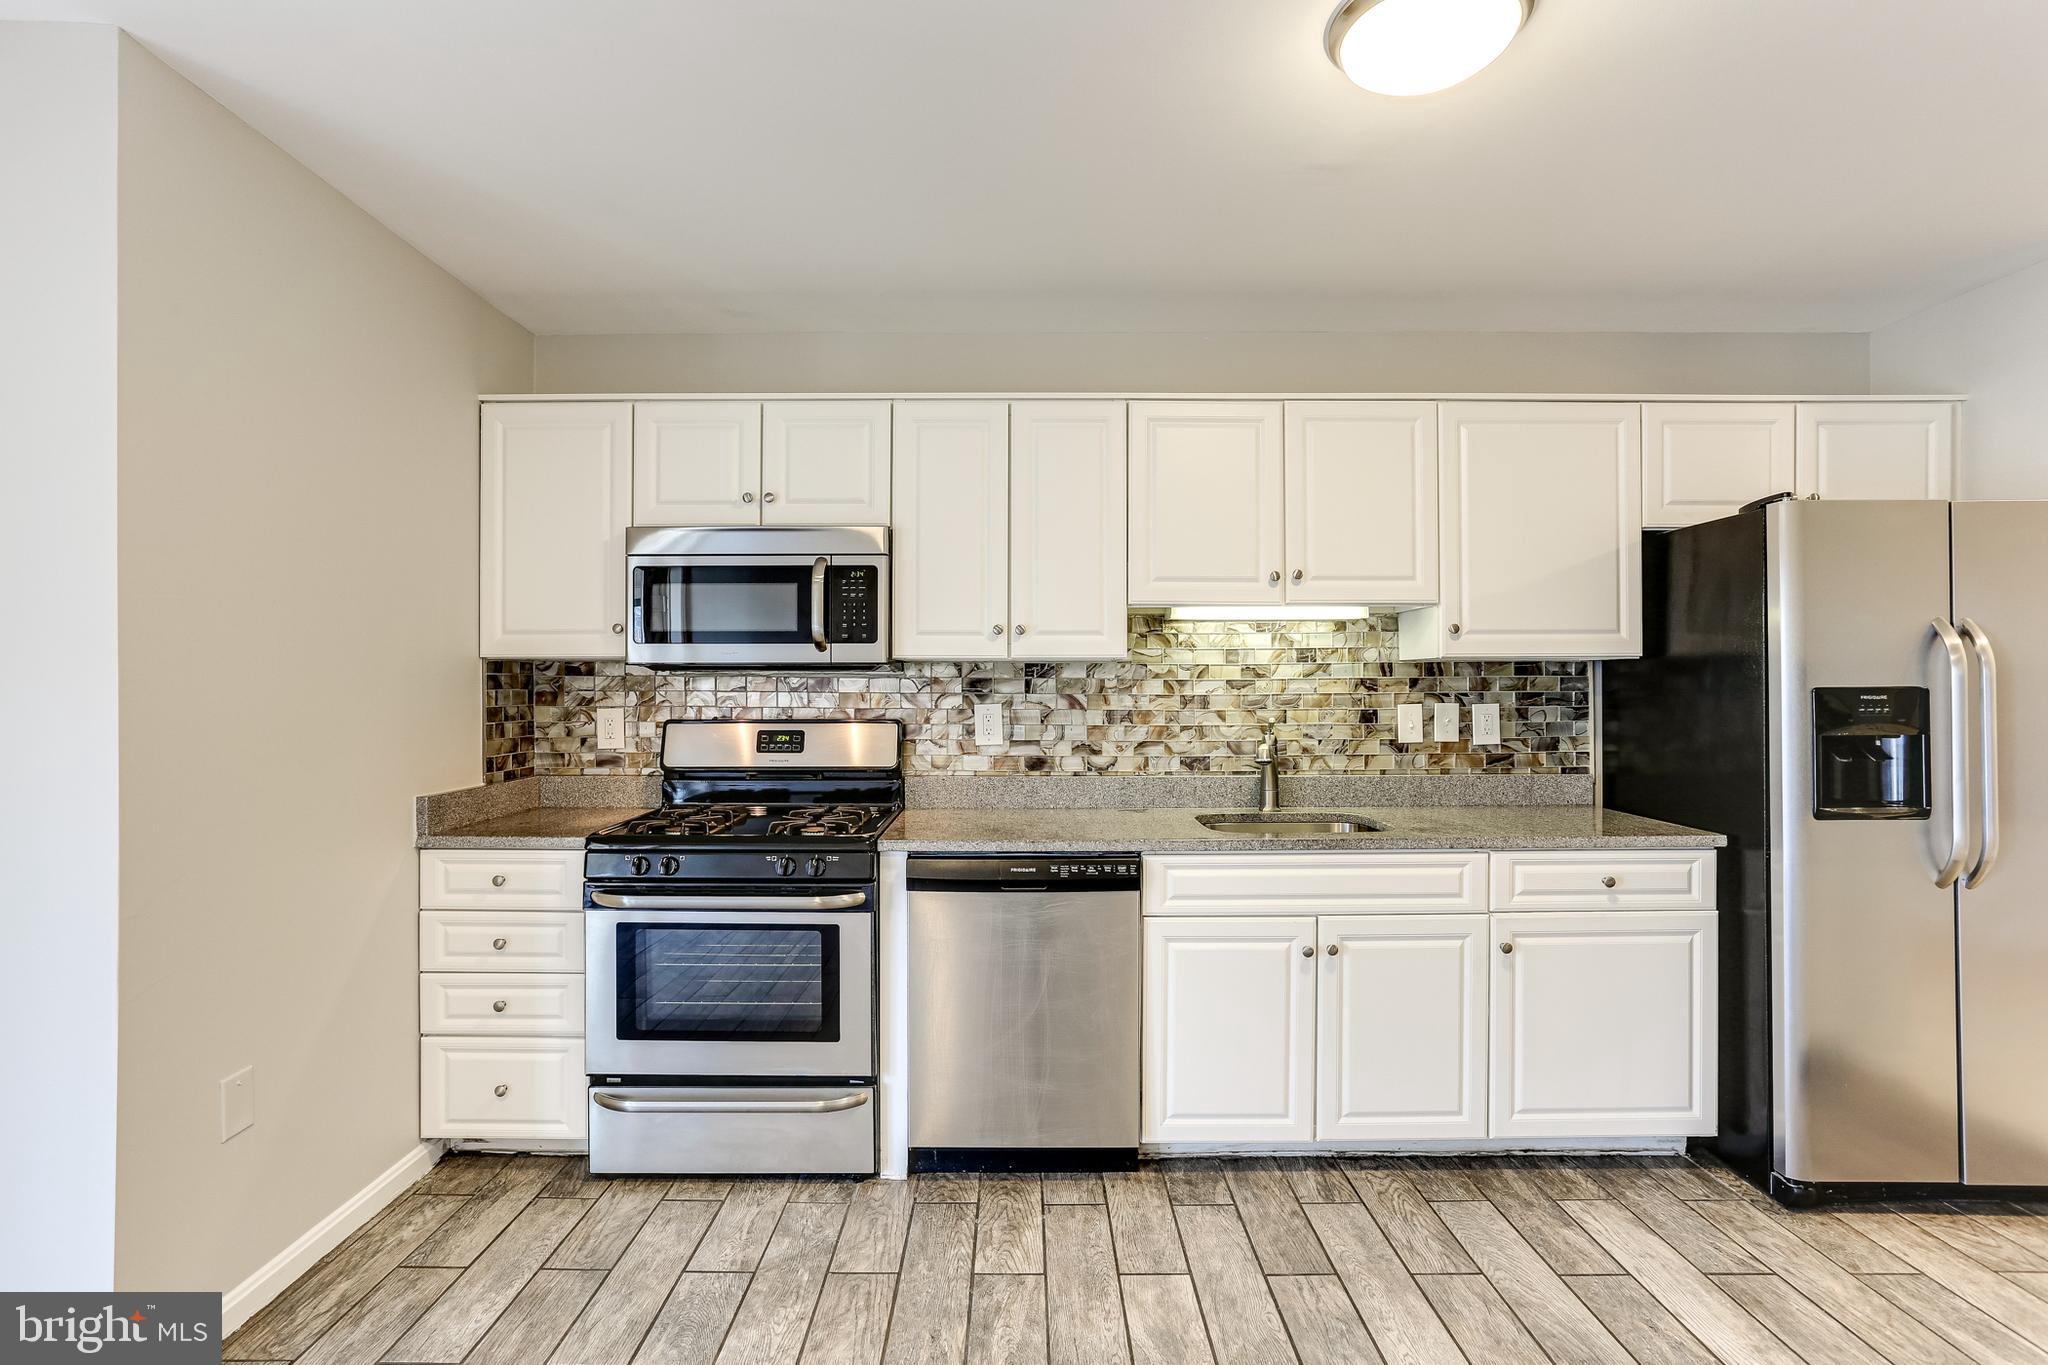 31 LAMBOURNE ROAD, BALTIMORE, Maryland 21204, 3 Bedrooms Bedrooms, ,2 BathroomsBathrooms,Condominium,For Sale,31 LAMBOURNE ROAD,MDBC520486